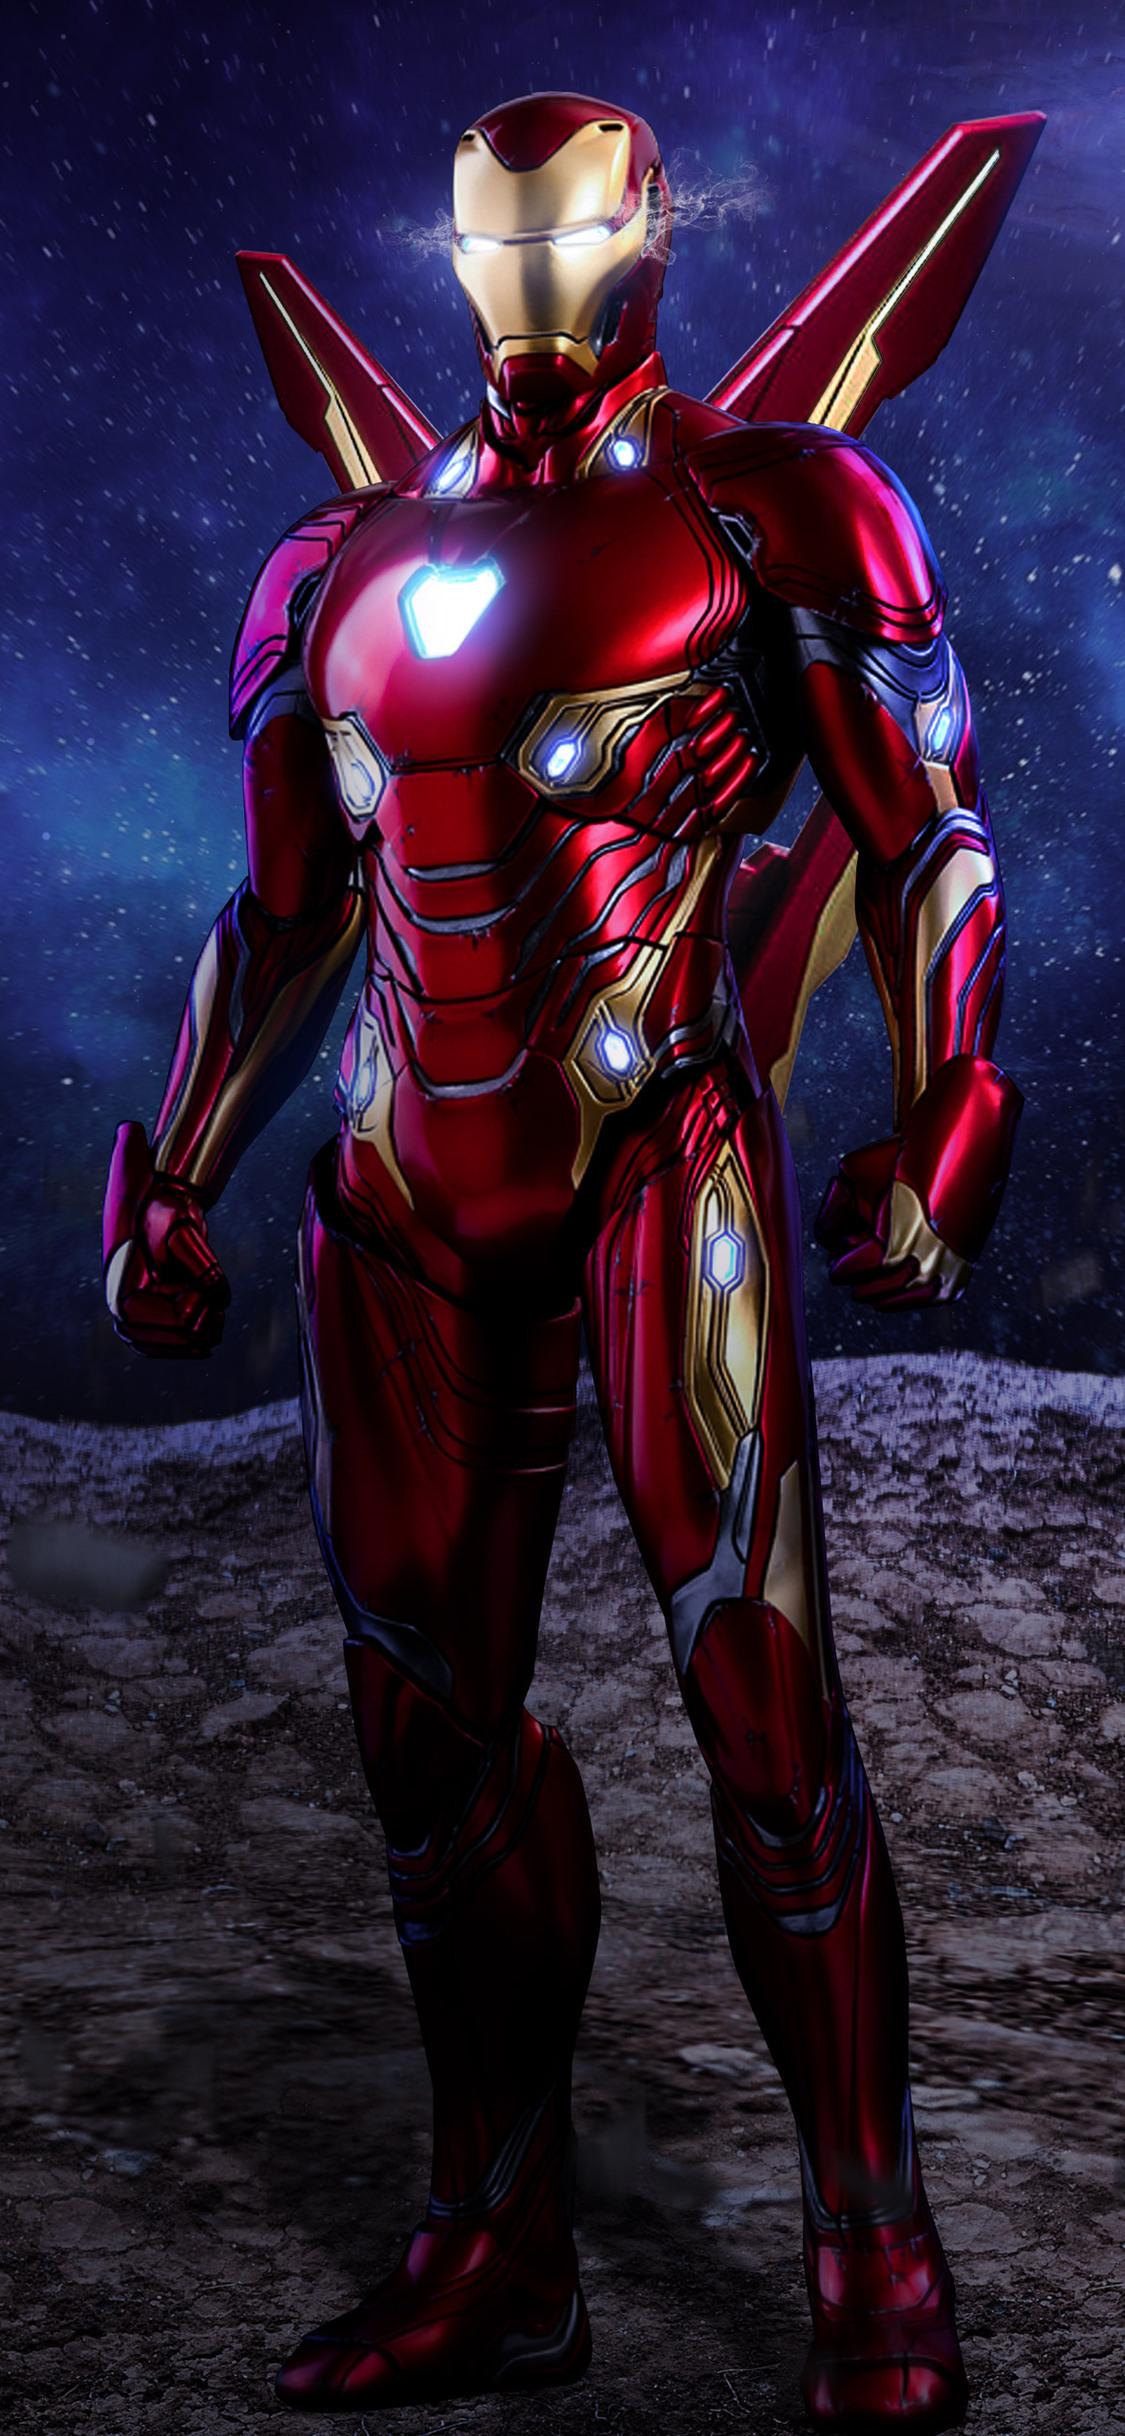 1125x2436 Iron Man Avengers Infinity War Suit Artwork Iphone Xs